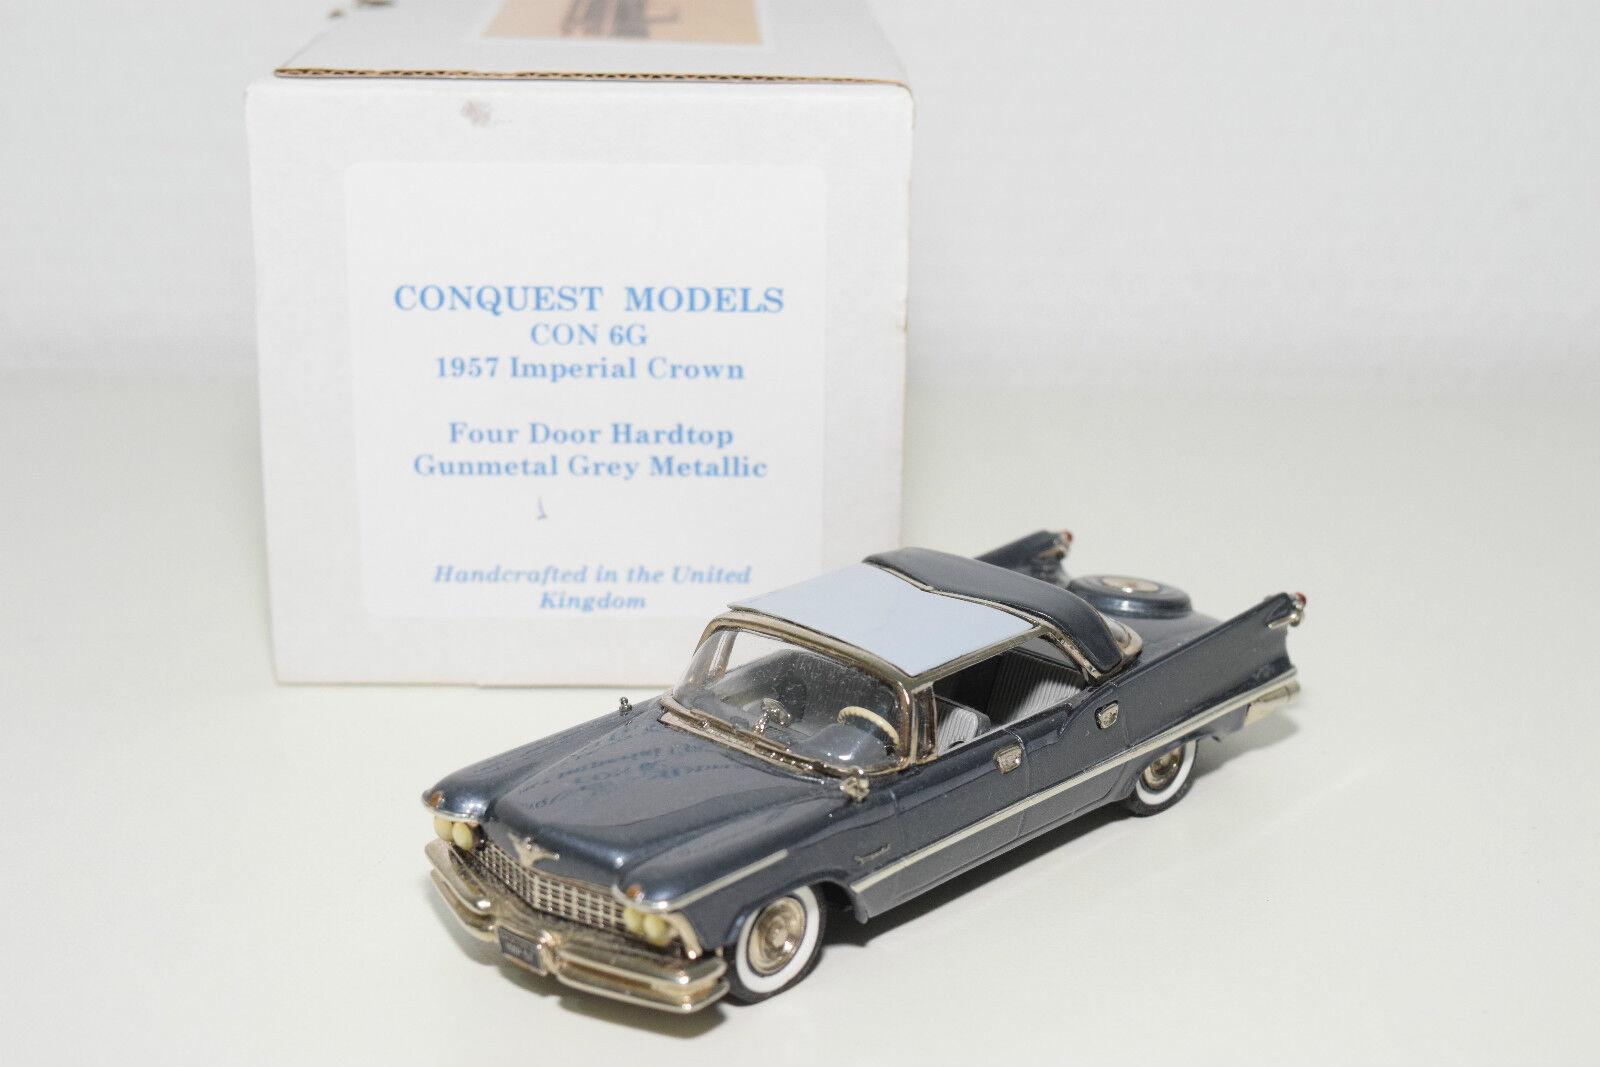 . CONQUEST MODELS 6G IMPERIAL CROWN FOUR DOOR HARDTOP 1957 1957 1957 MET. GREY MINT BOXED 455953